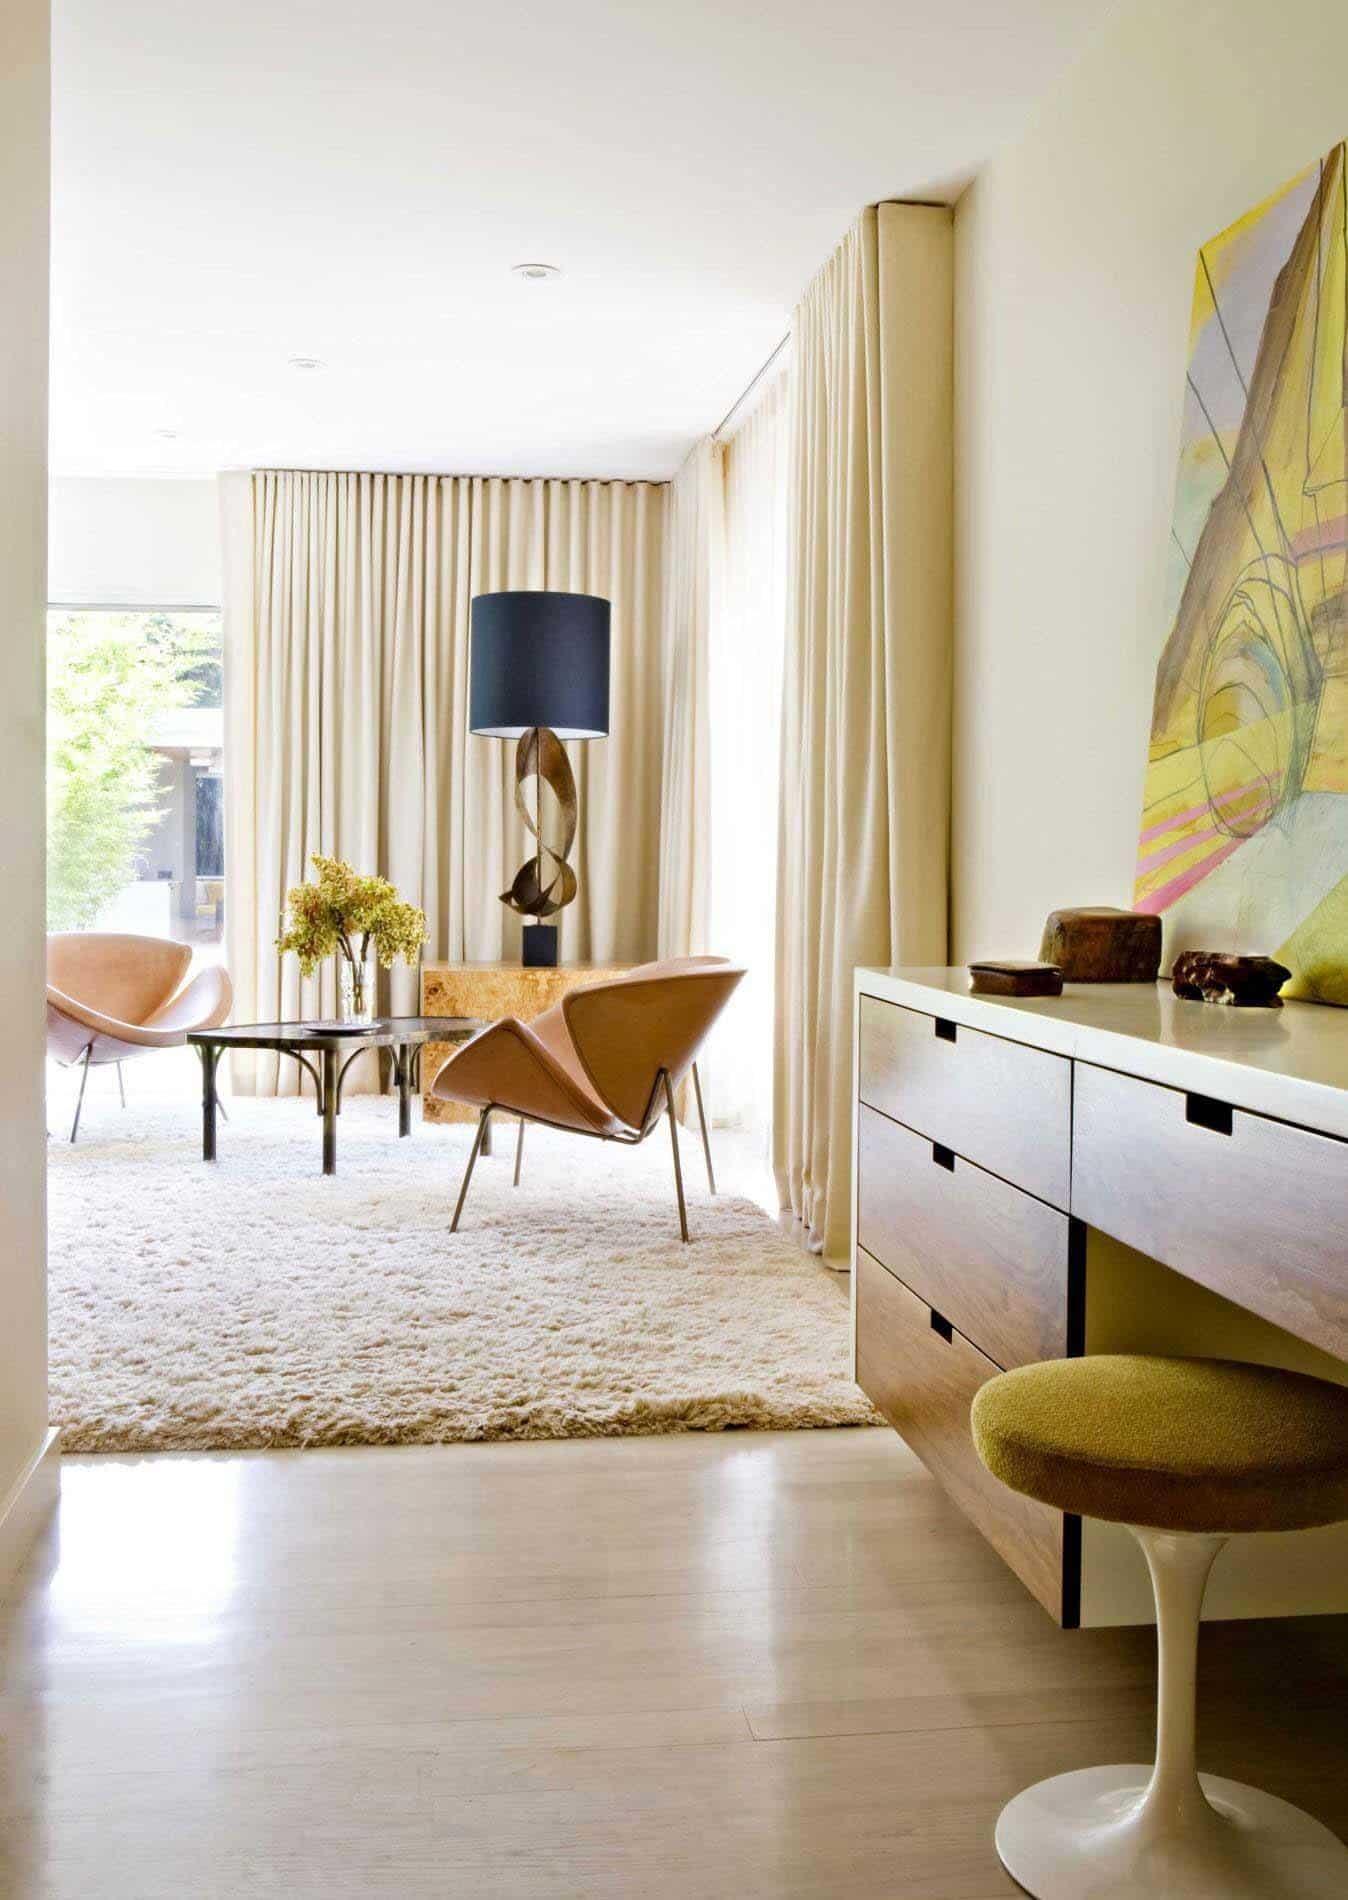 Maison Moderne Mid-Century-Jamie Bush-09-1 Kindesign